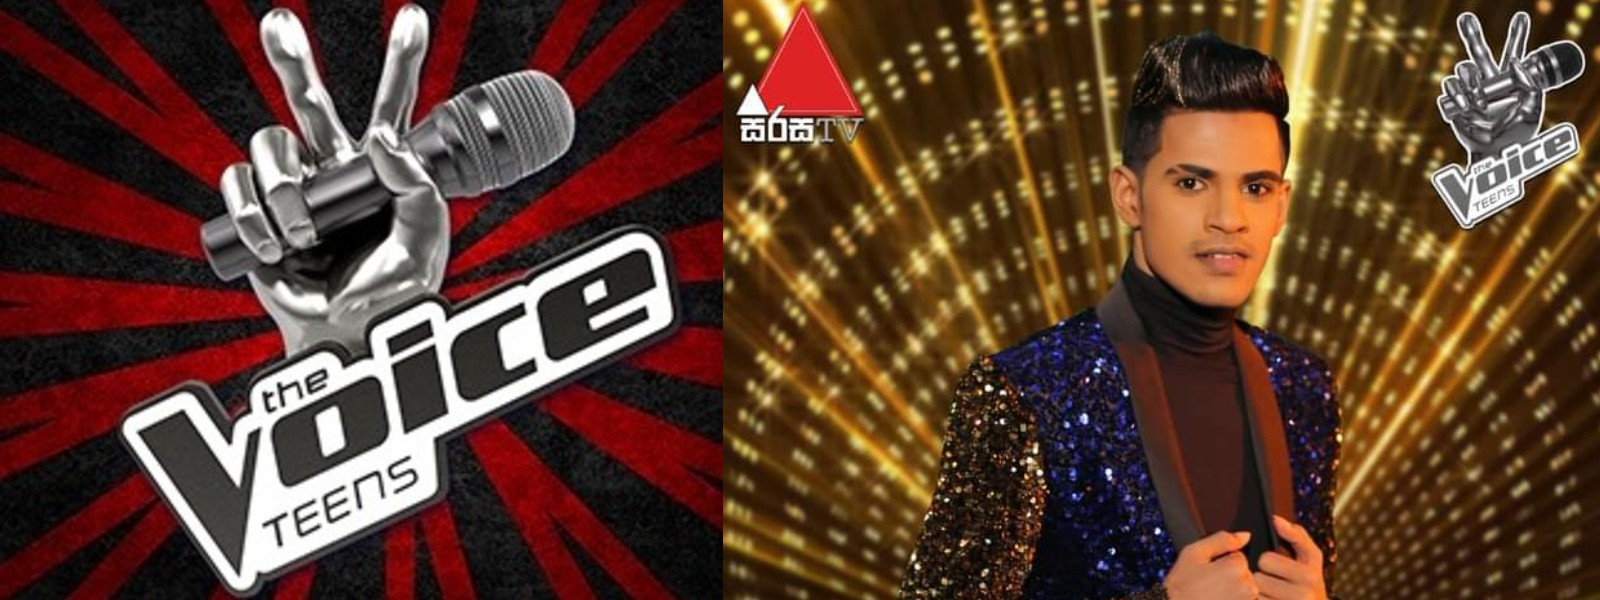 Hashen crowned winner of – The Voice Teens Sri Lanka